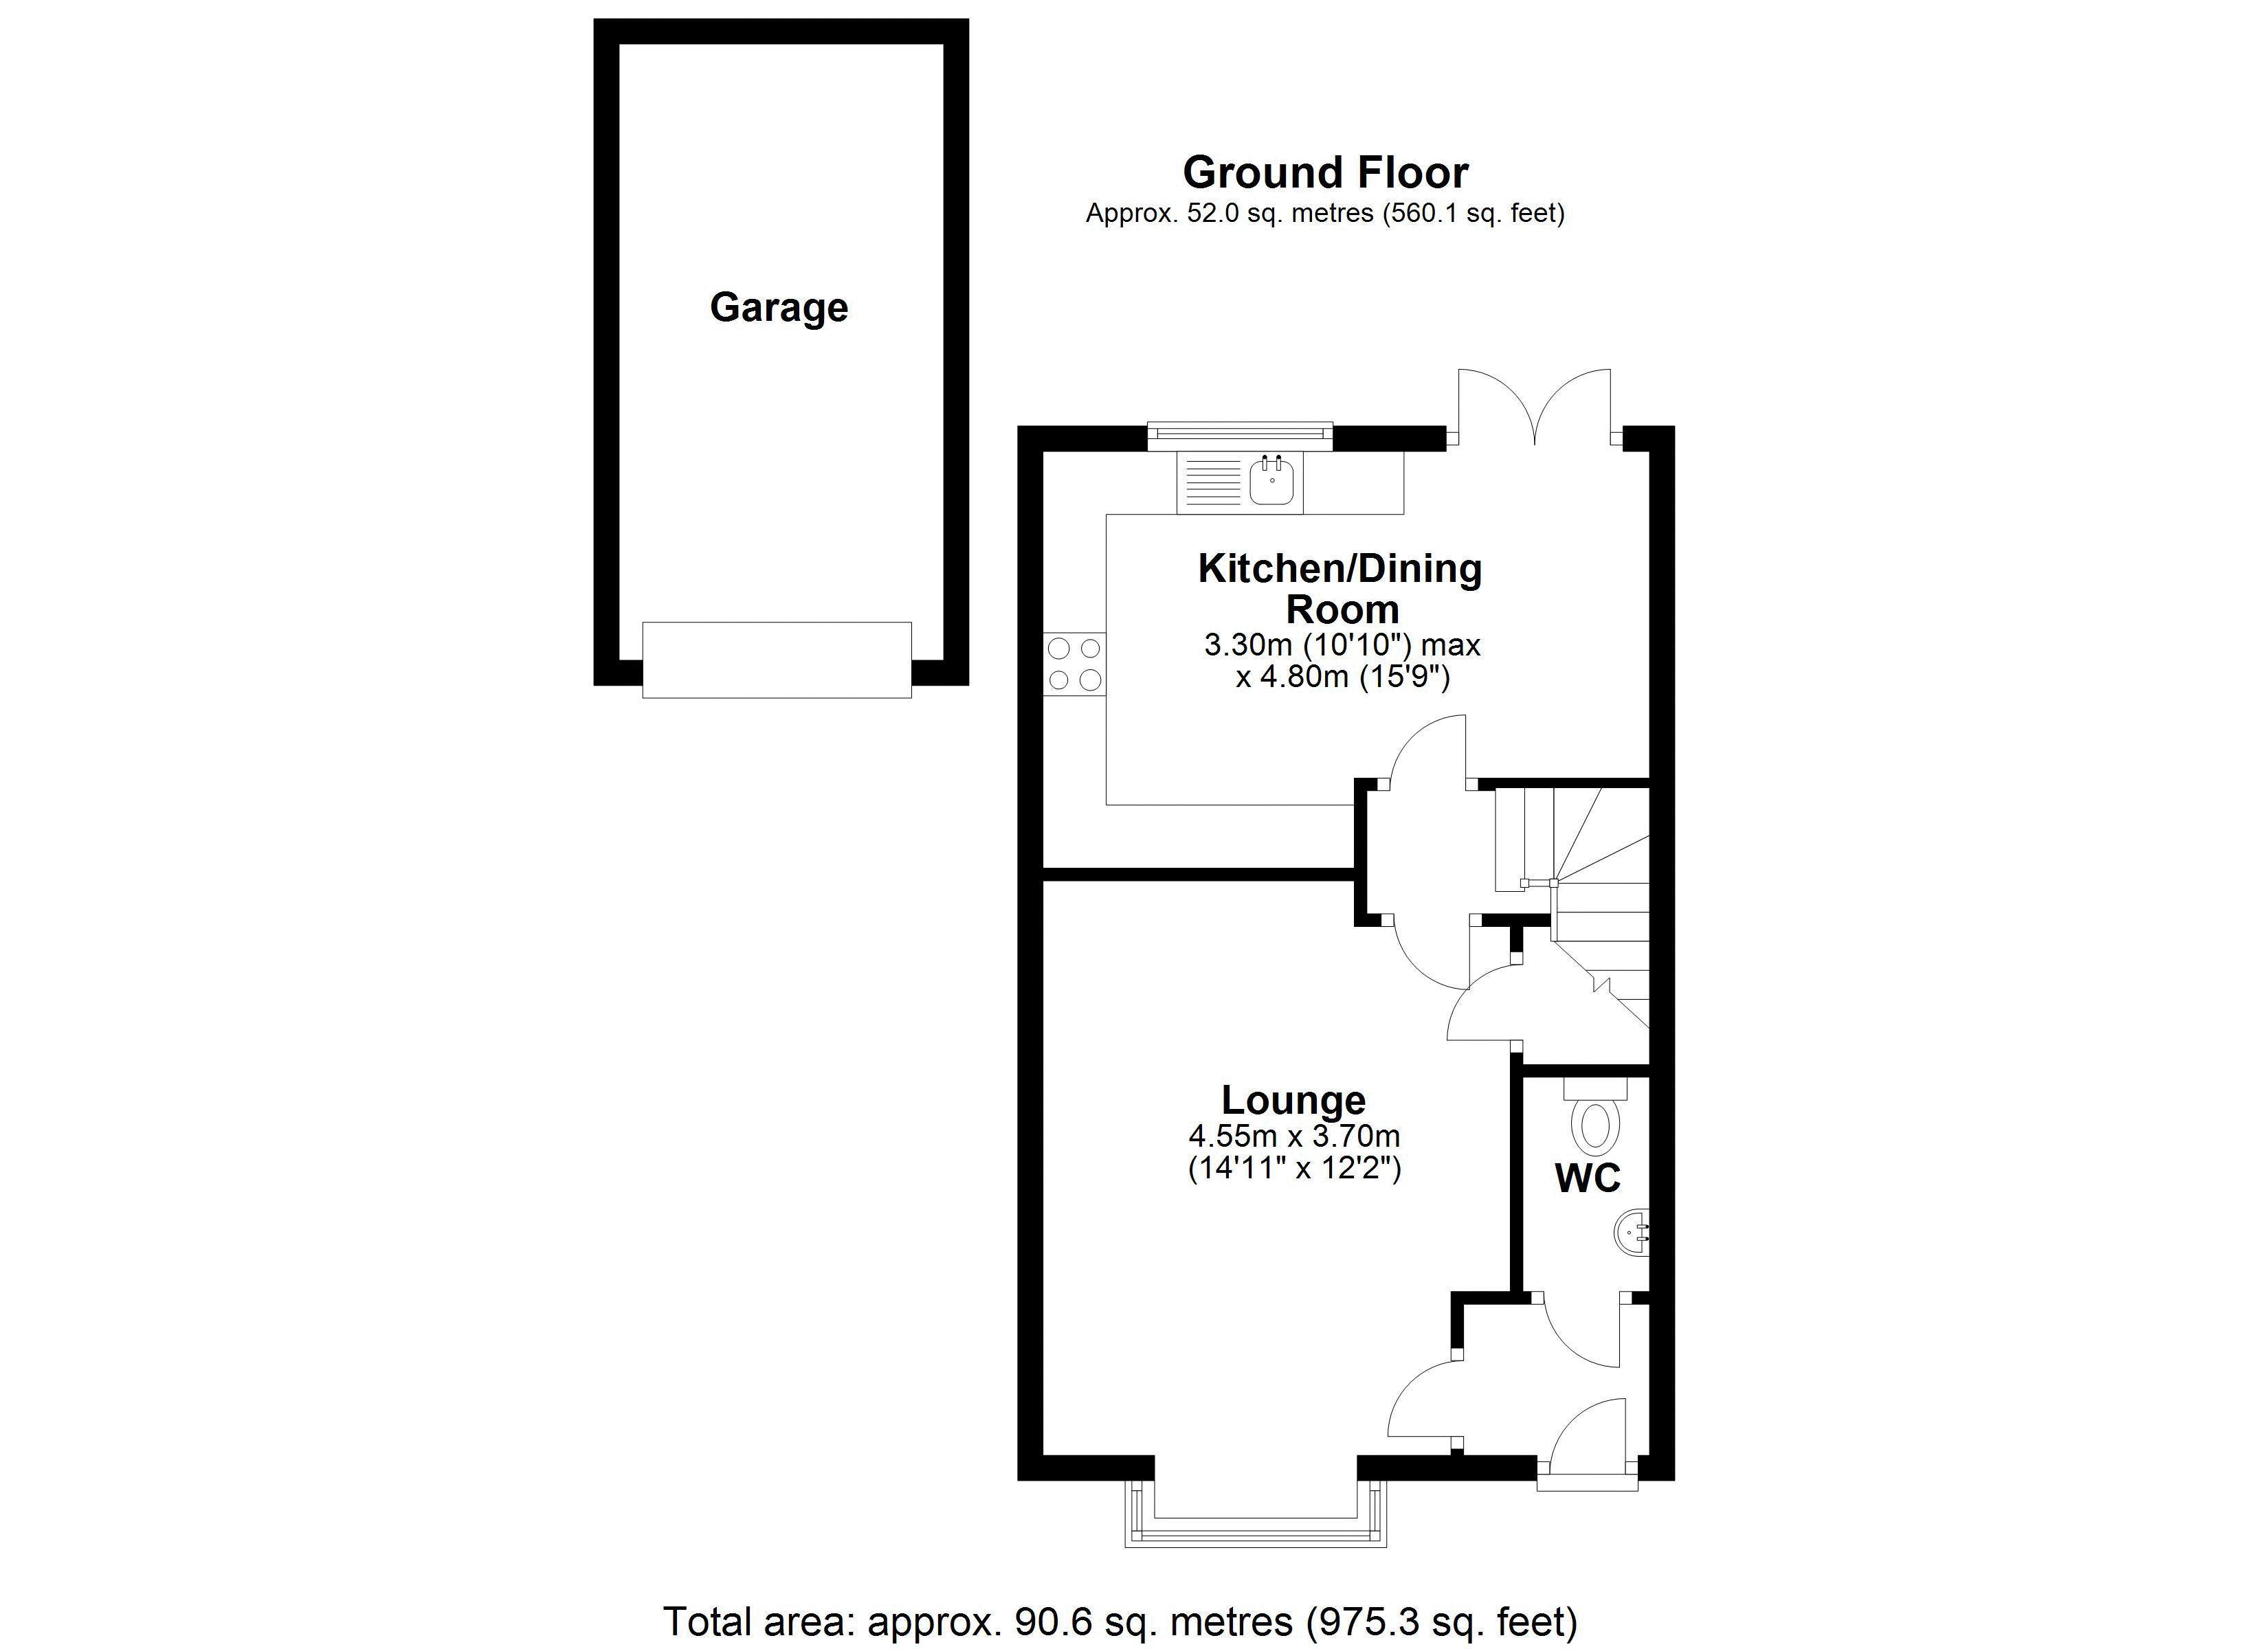 8 Wooding Drive Ground floor plan